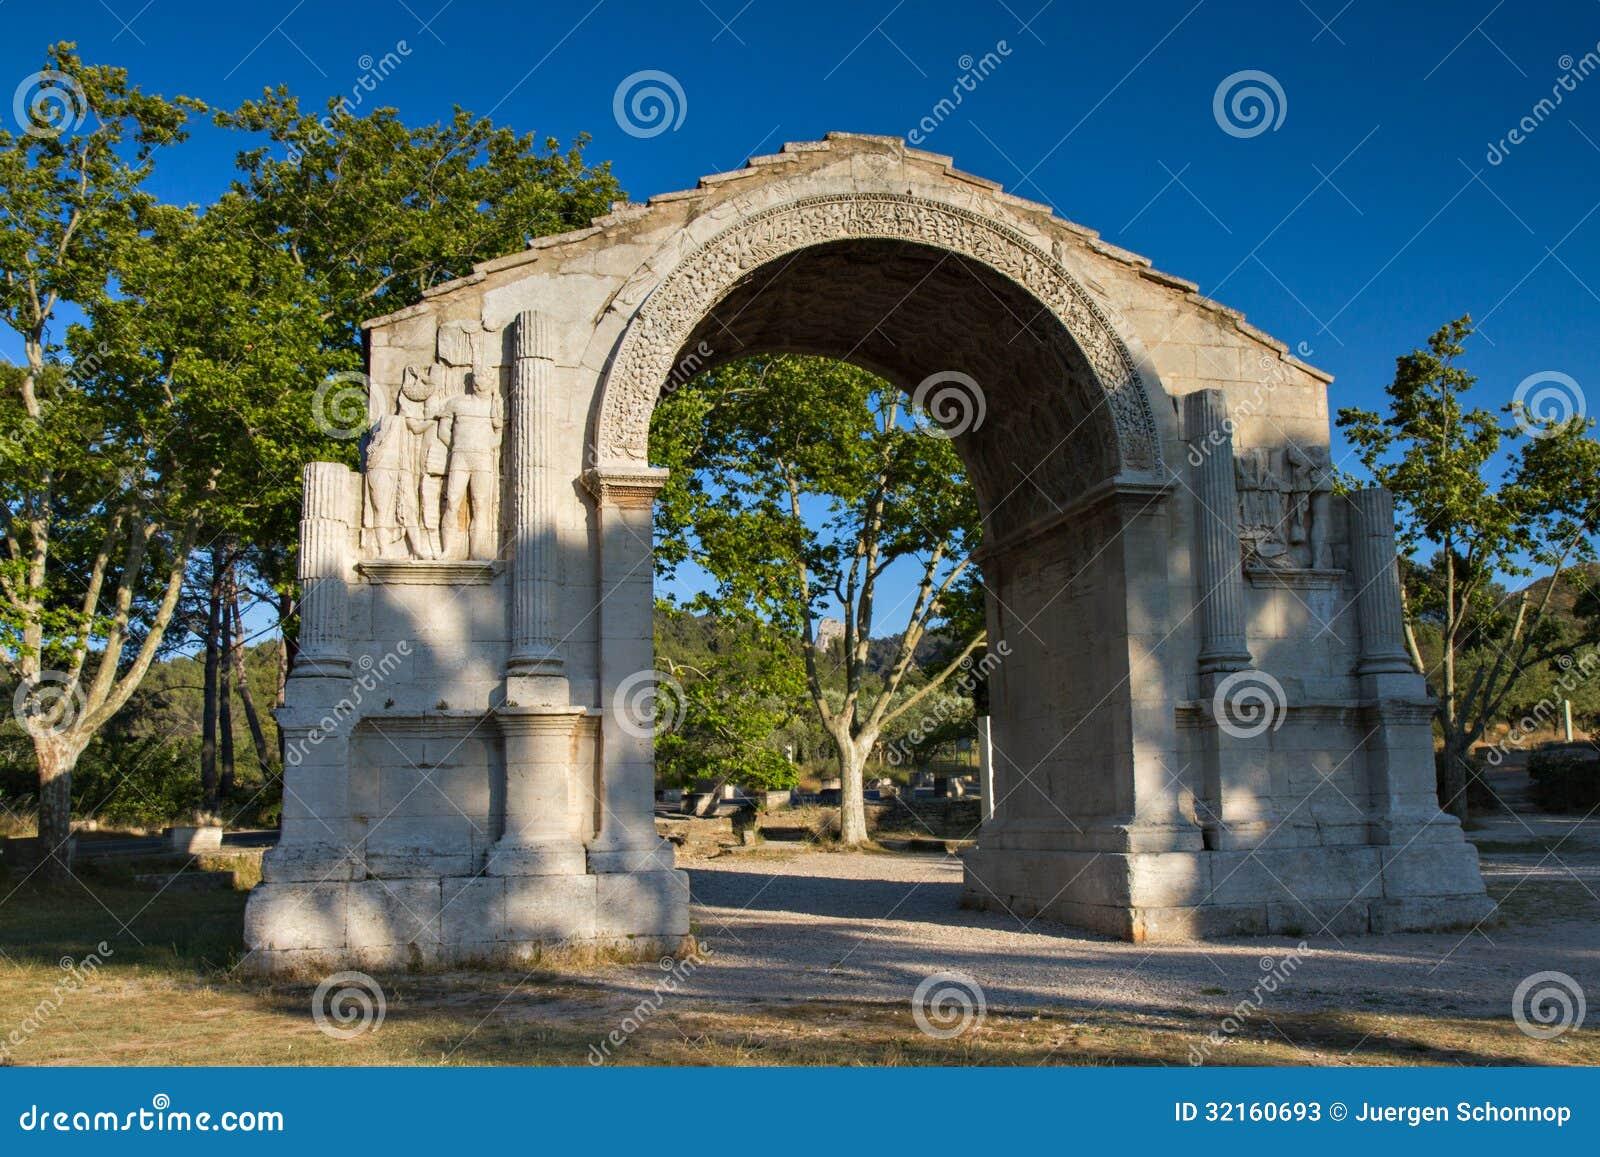 Triumphal roman archs essay